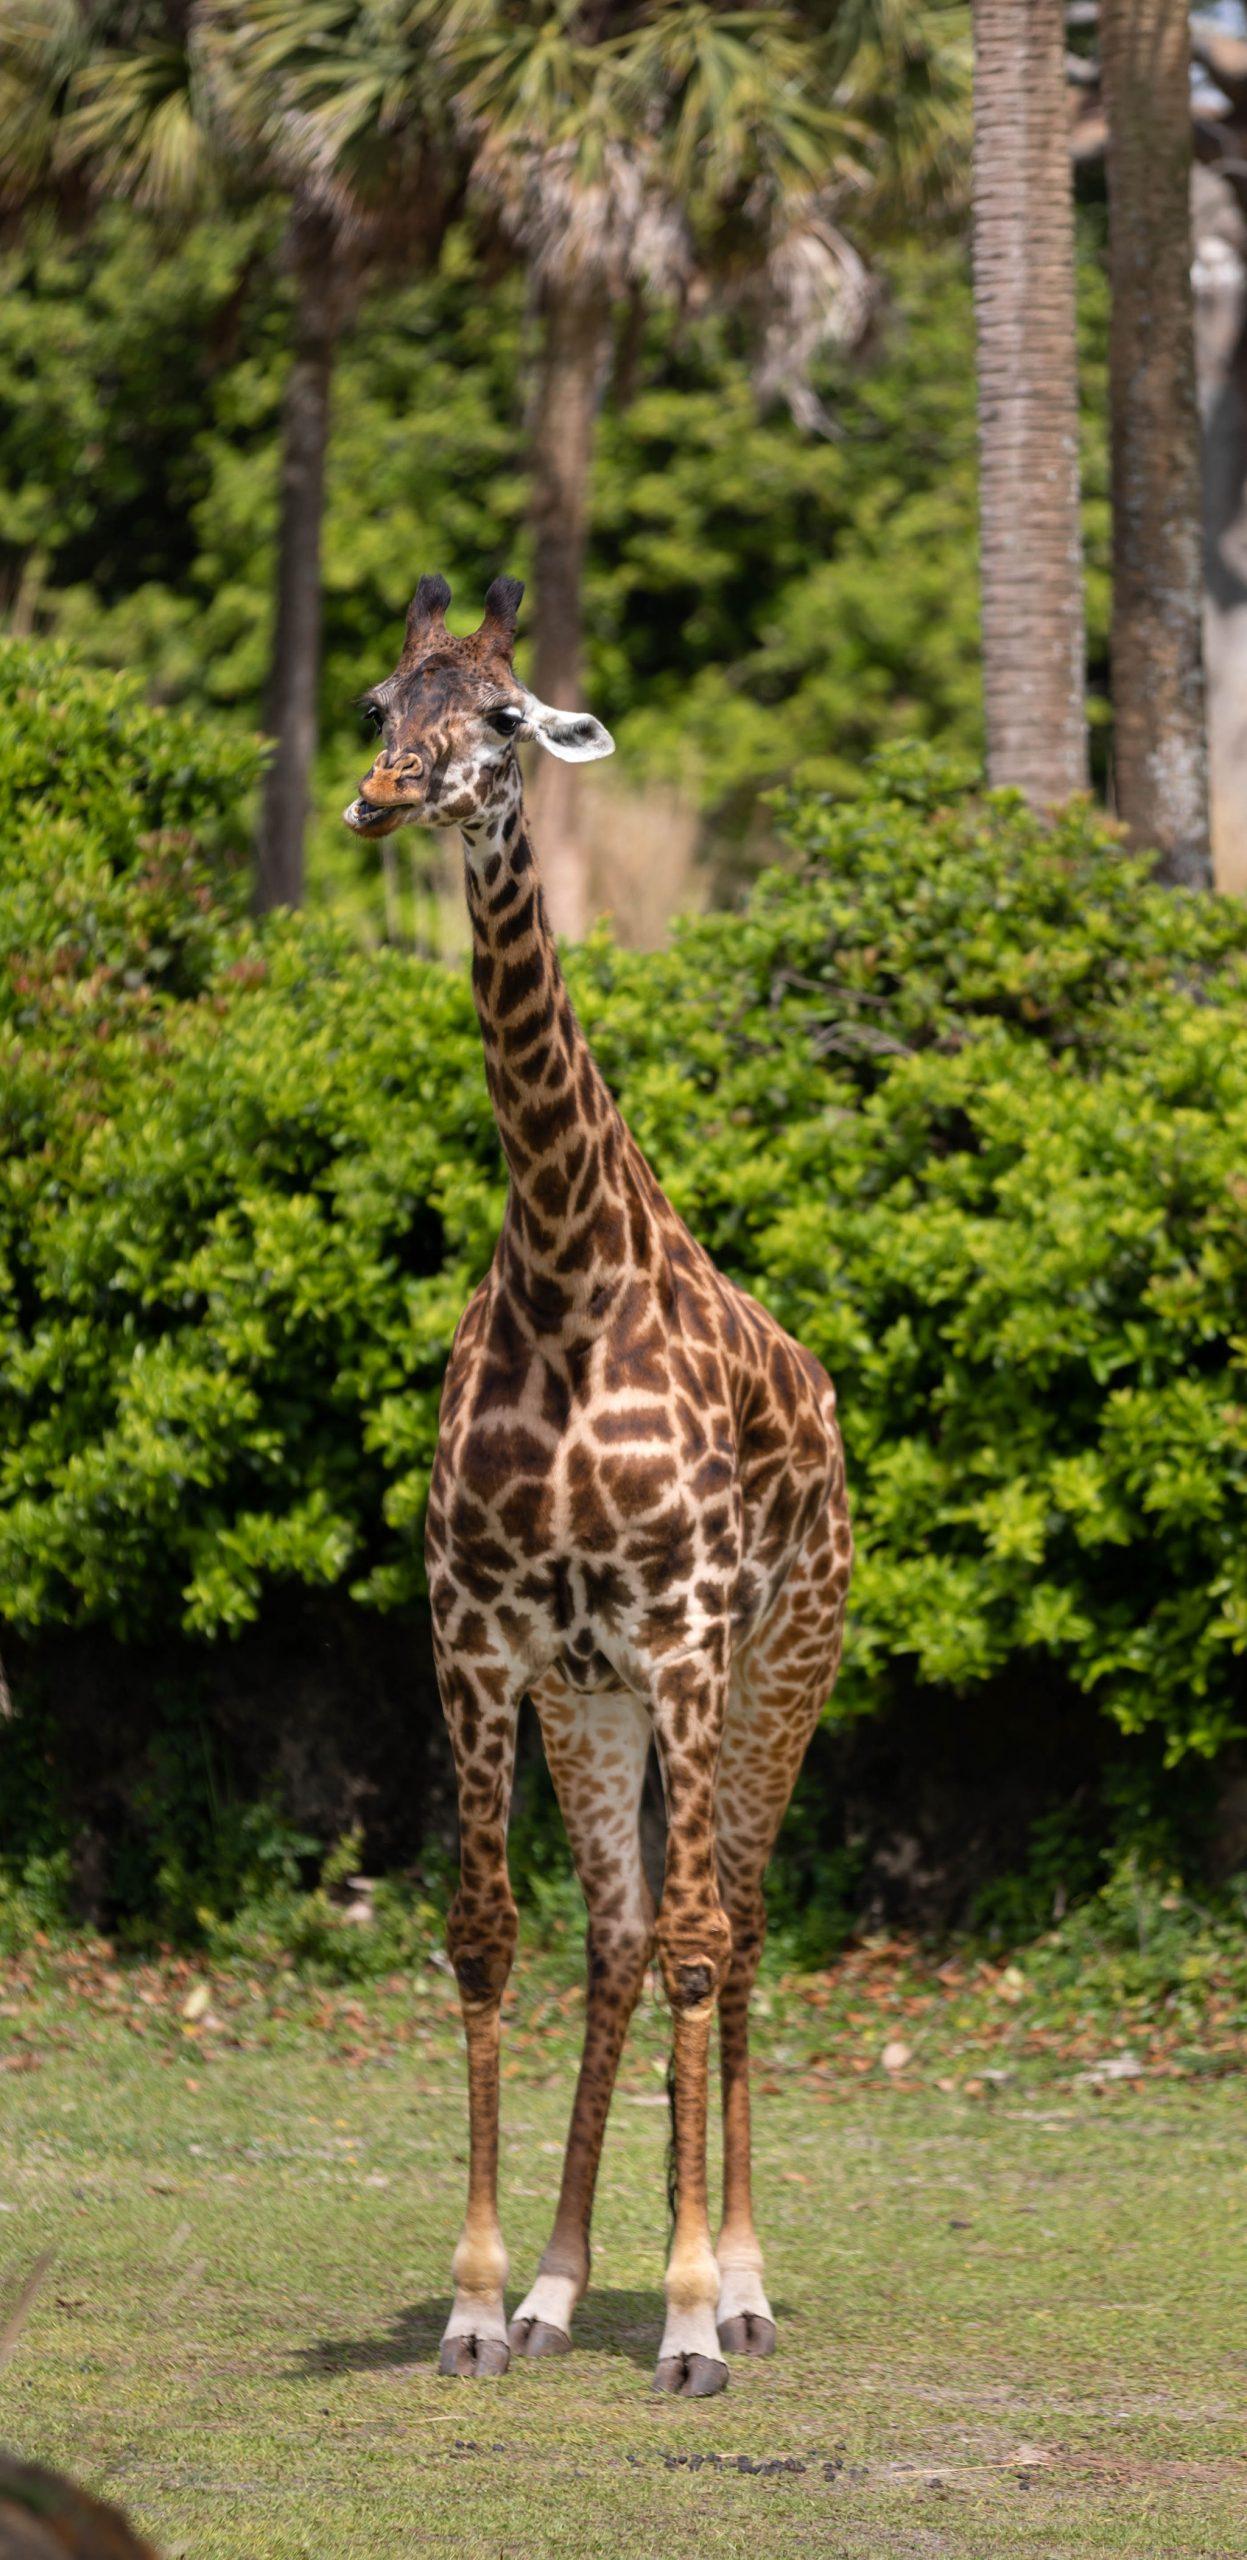 Animal Kingdom Kilimanjaro Safari Giraffe Sighting Photographed by Annie Fairfax